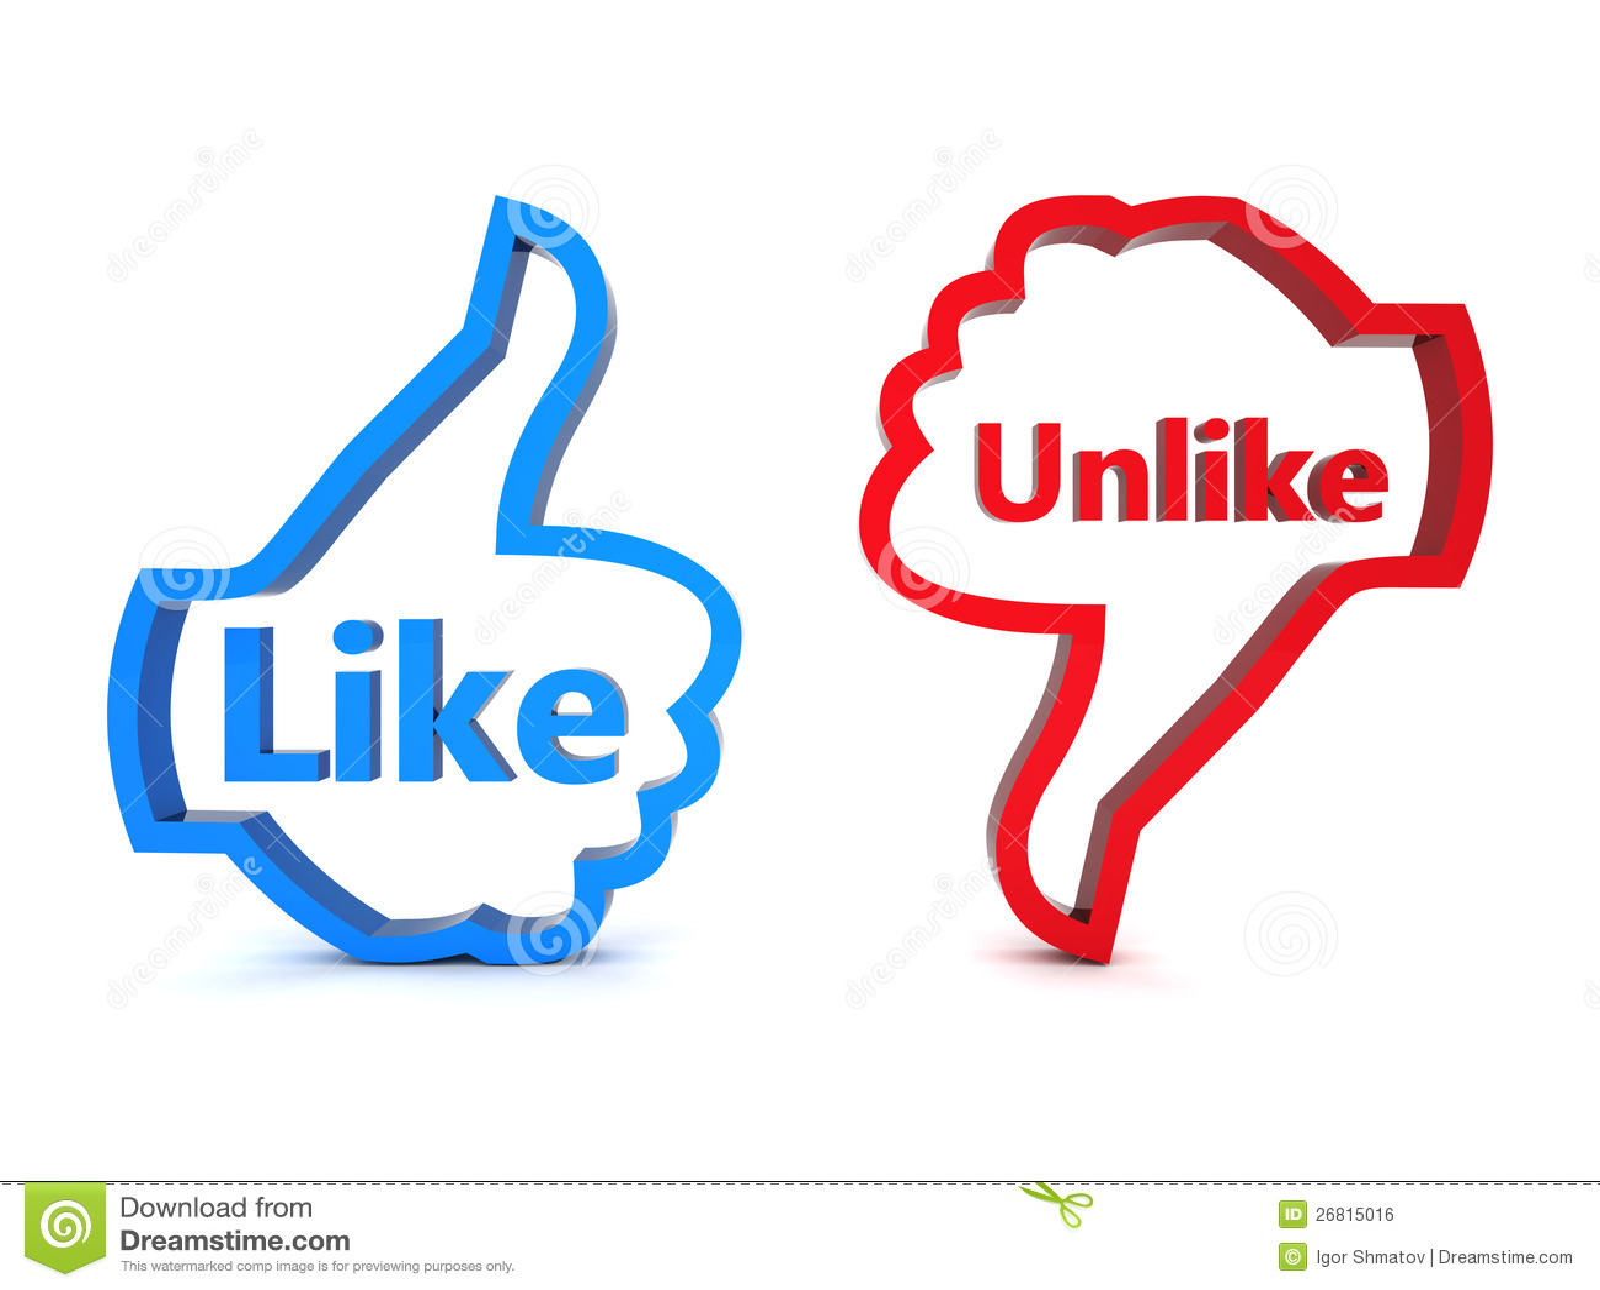 Like And Unlike Royalty Free Stock Image Image 26815016